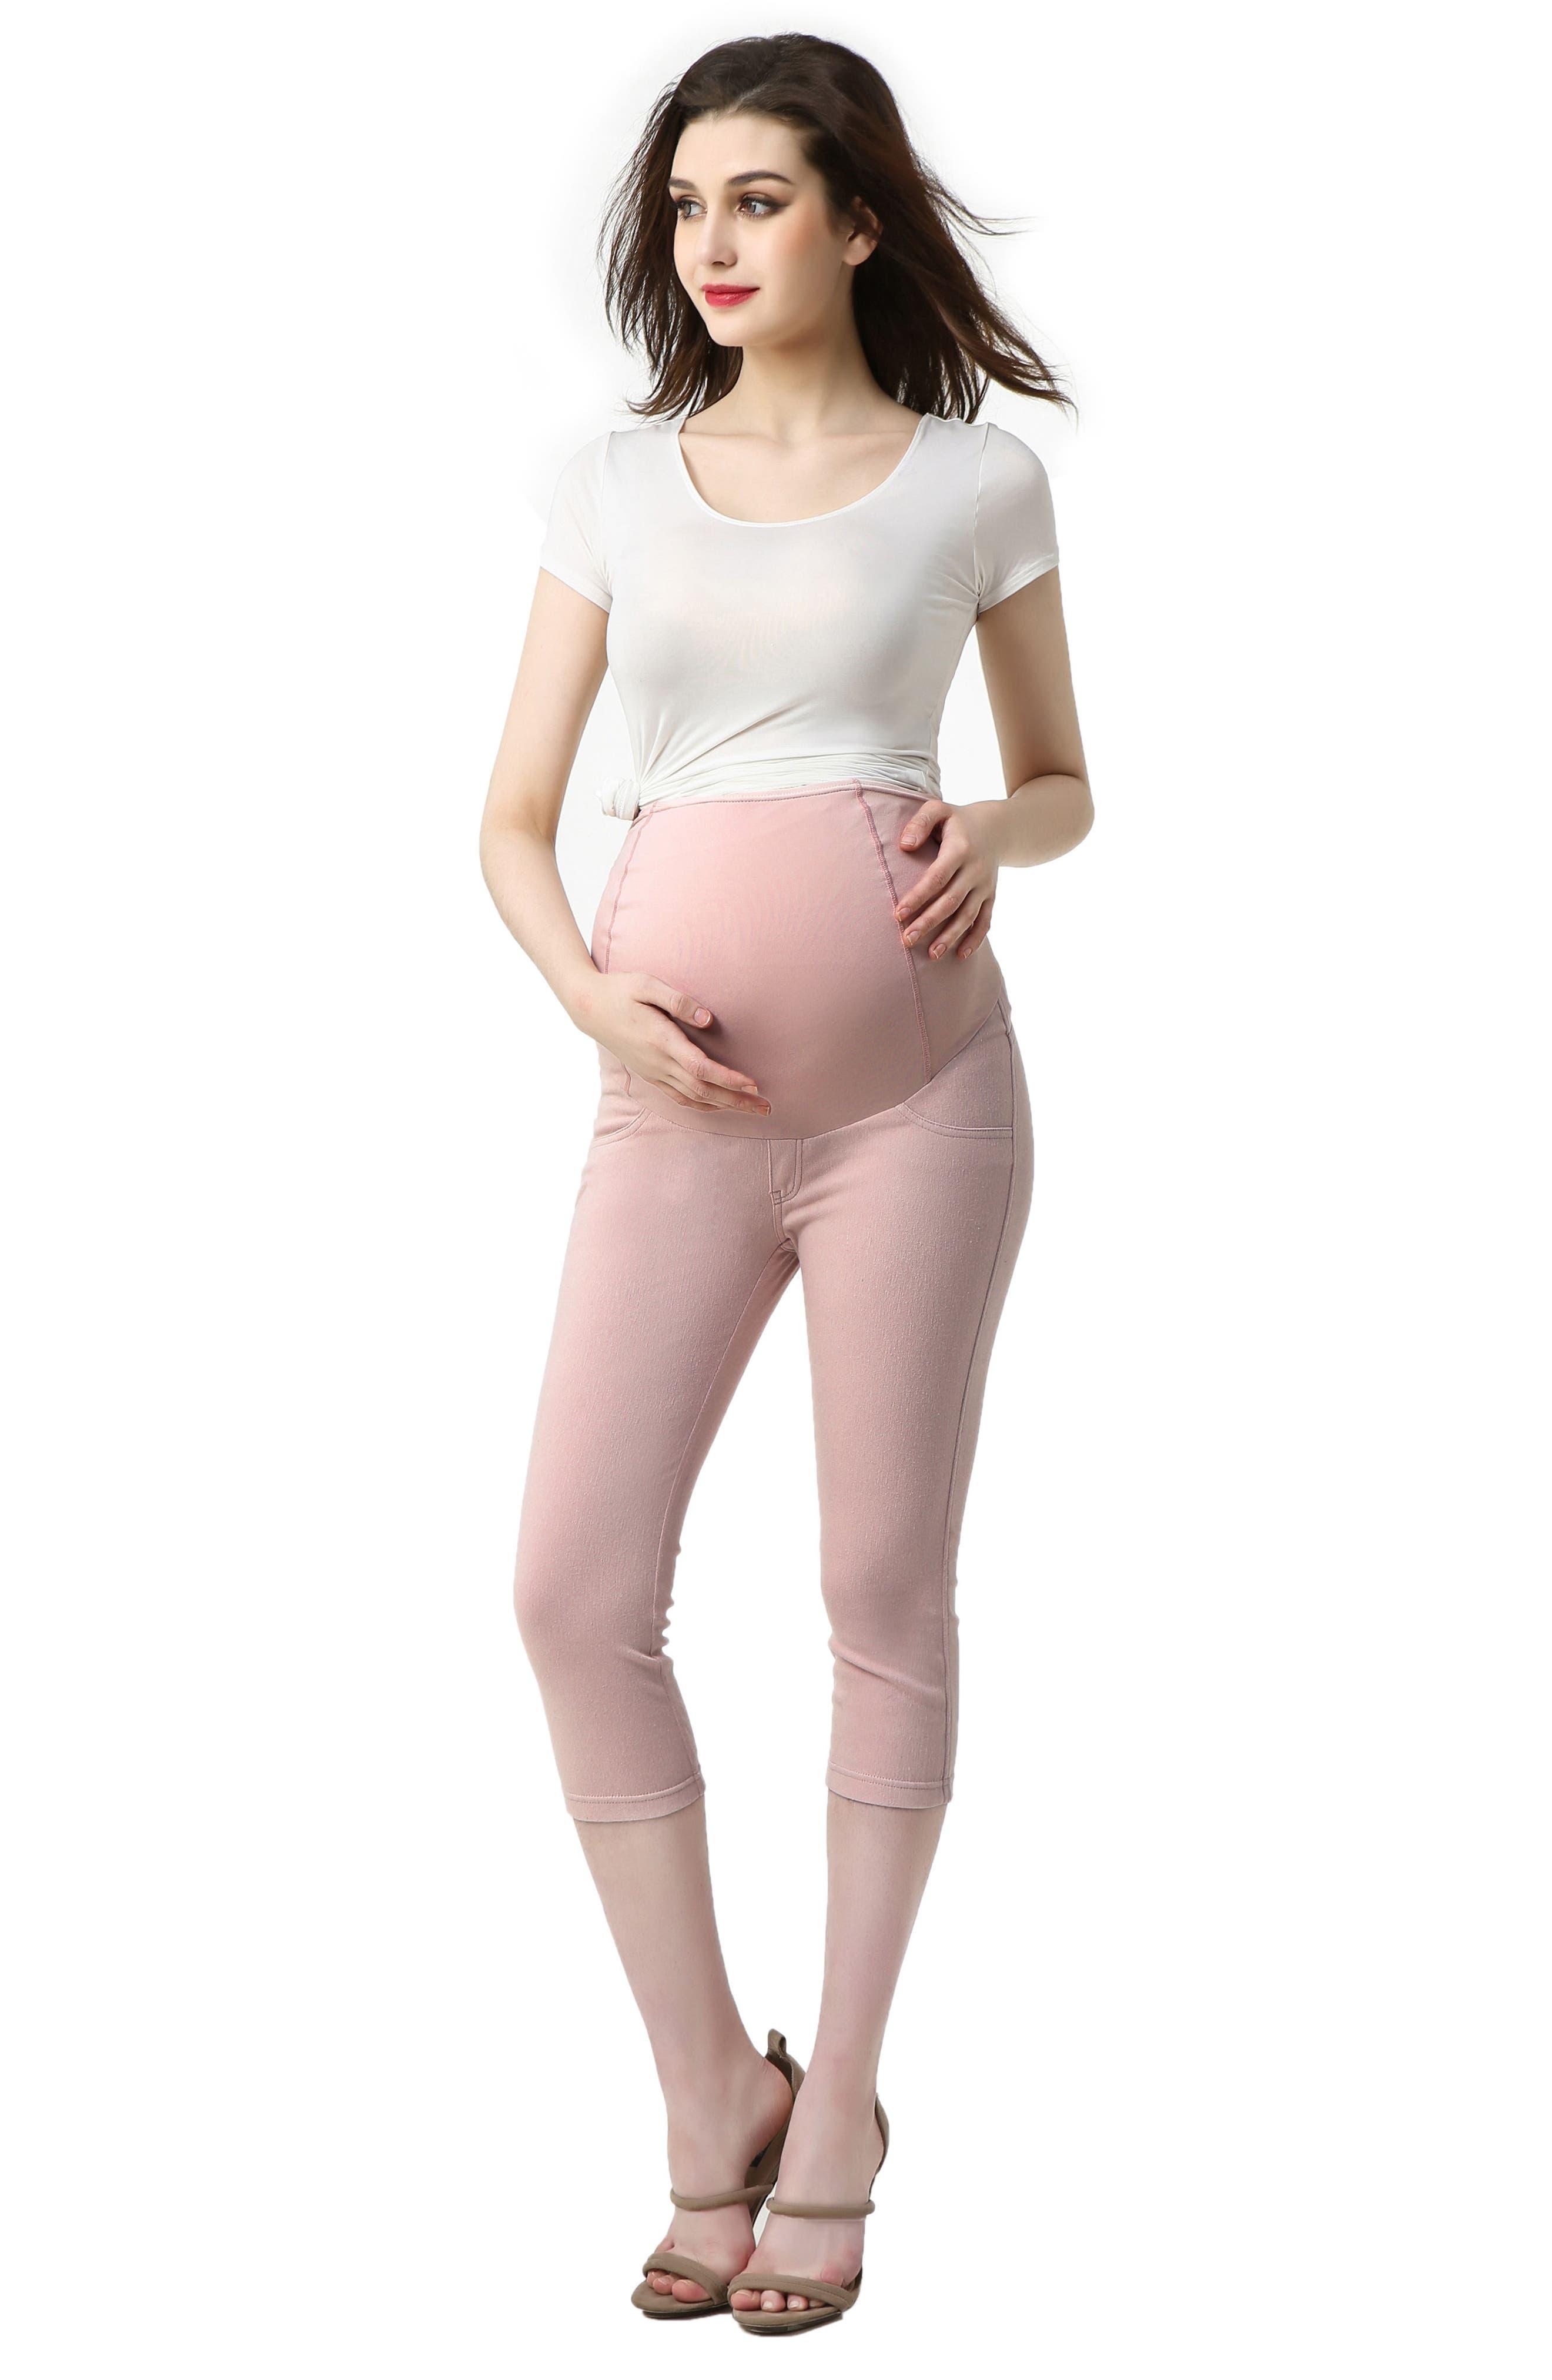 Melody Capri Denim Maternity Leggings,                             Alternate thumbnail 5, color,                             WHITE